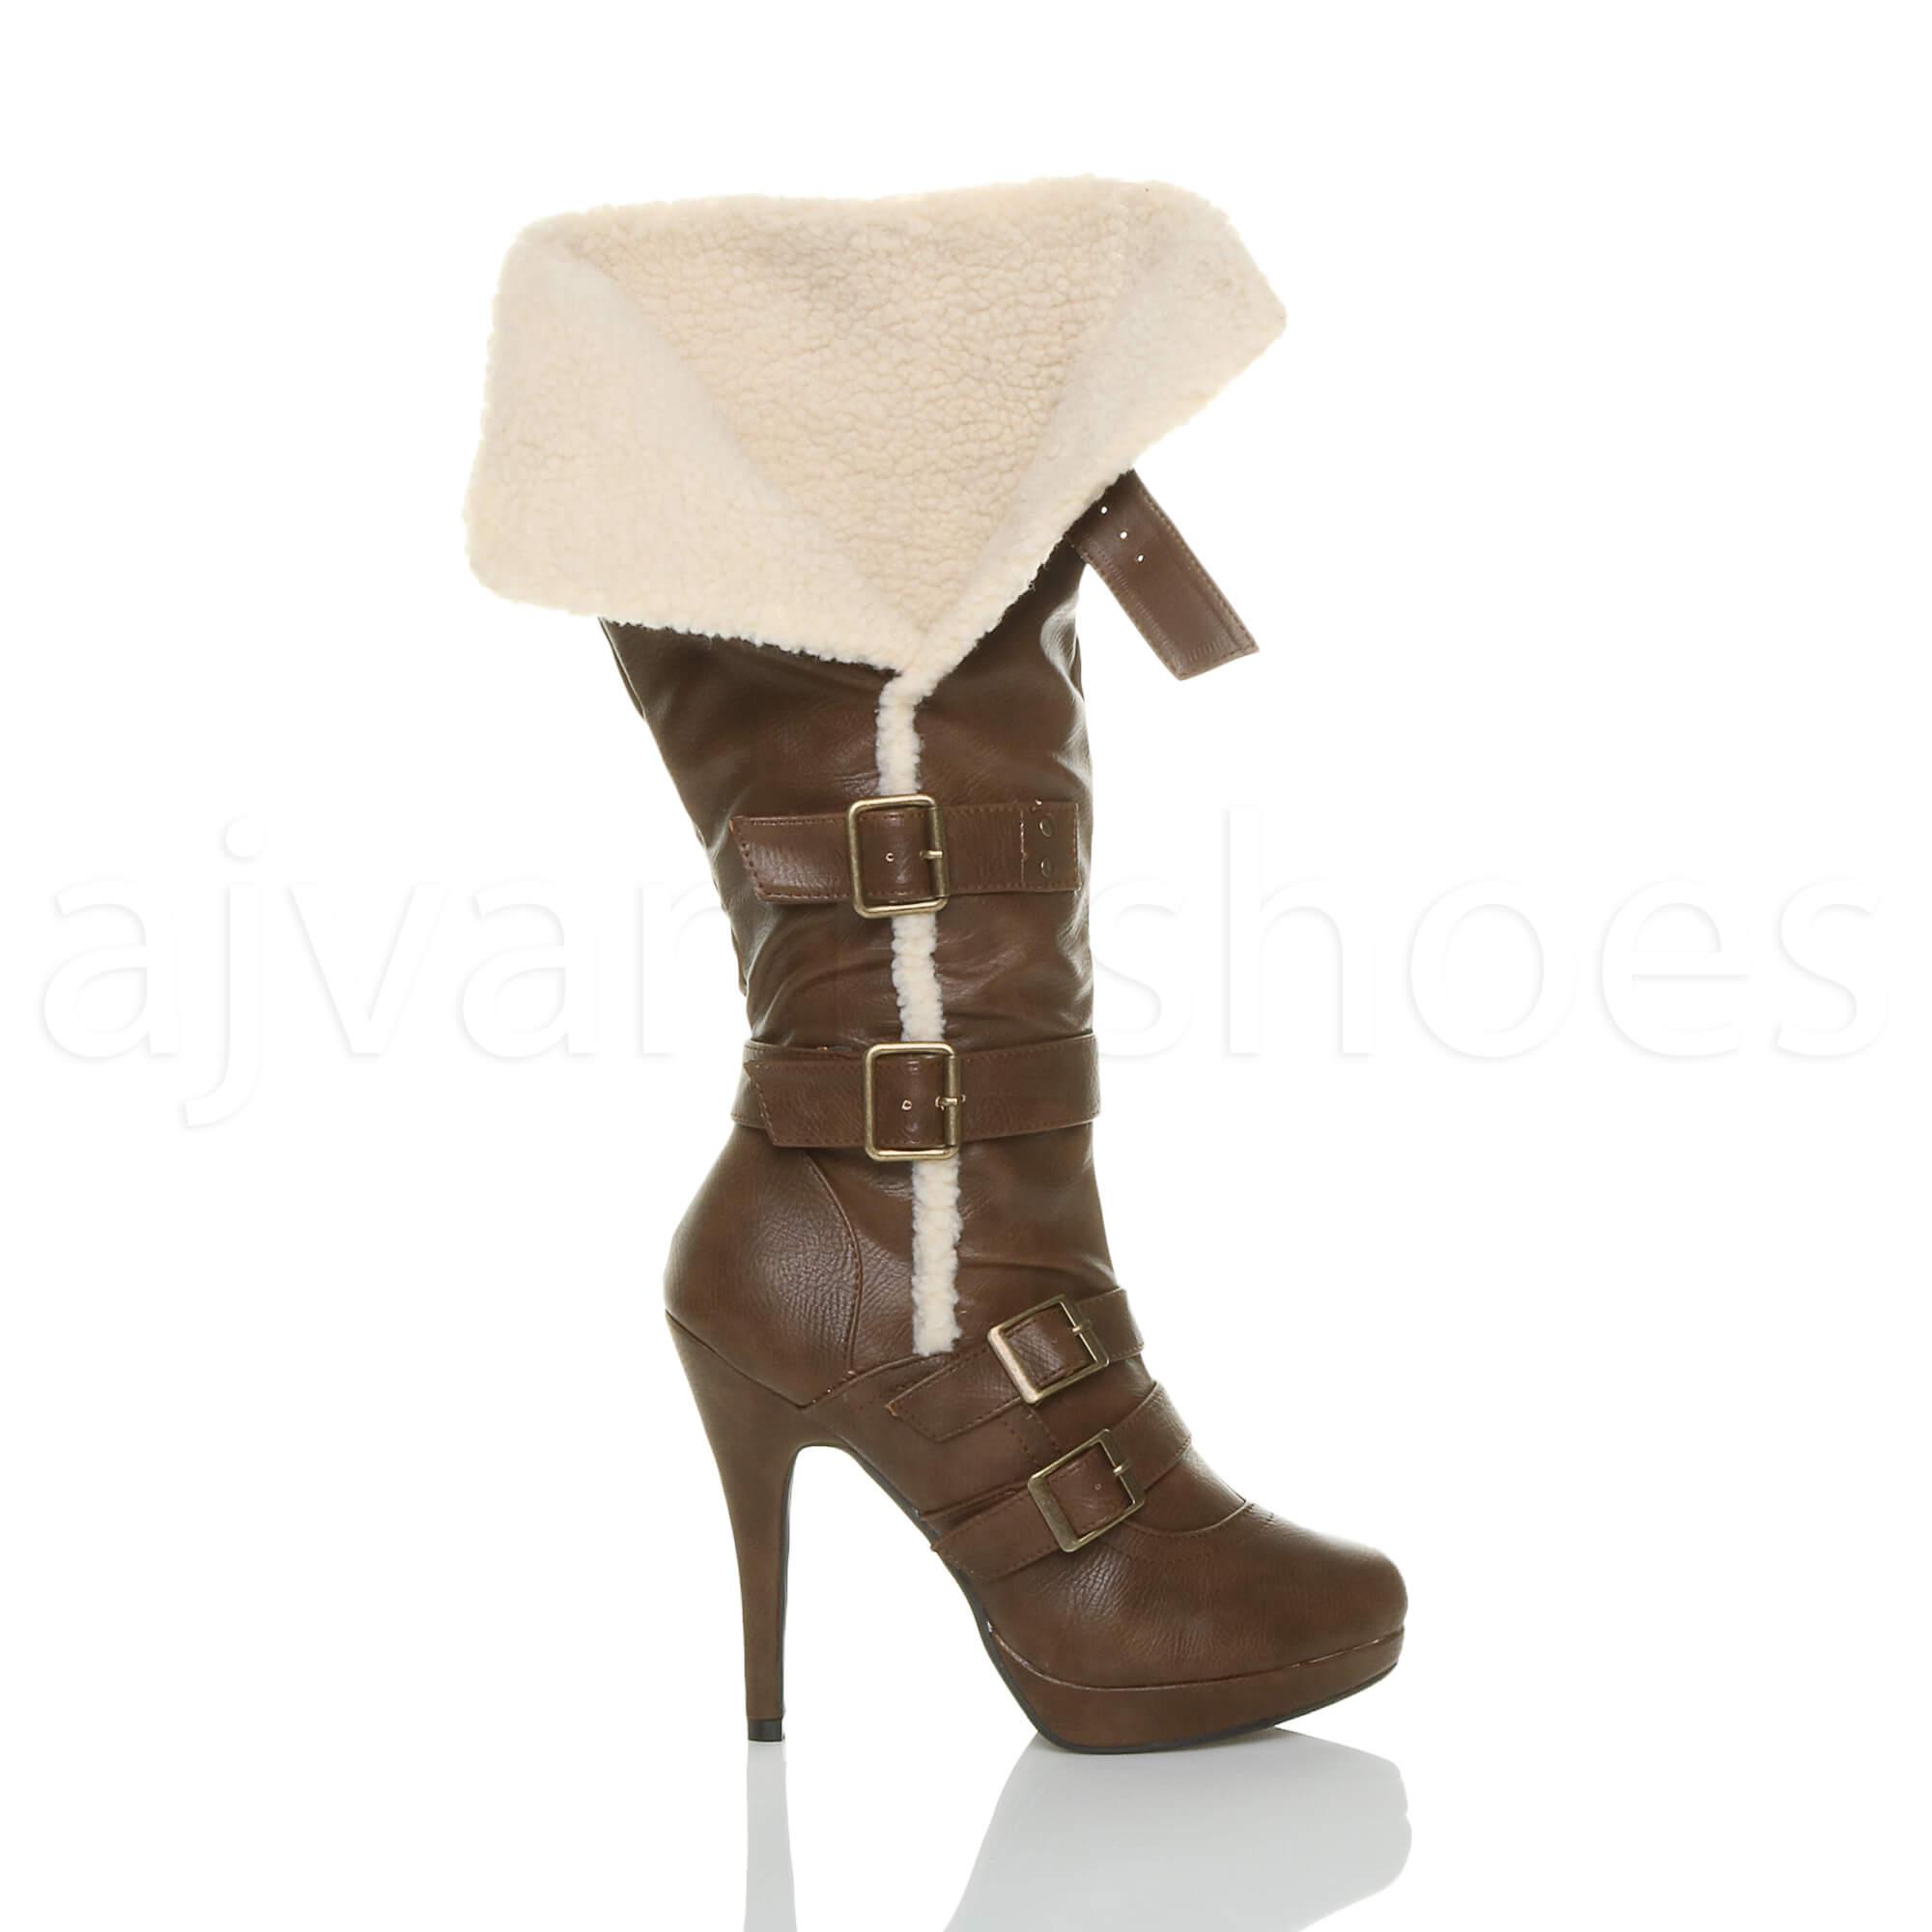 WOMENS-LADIES-HIGH-HEEL-BUCKLE-AVIATOR-SHEARLING-FUR-WINTER-CALF-KNEE-BOOTS-SIZE